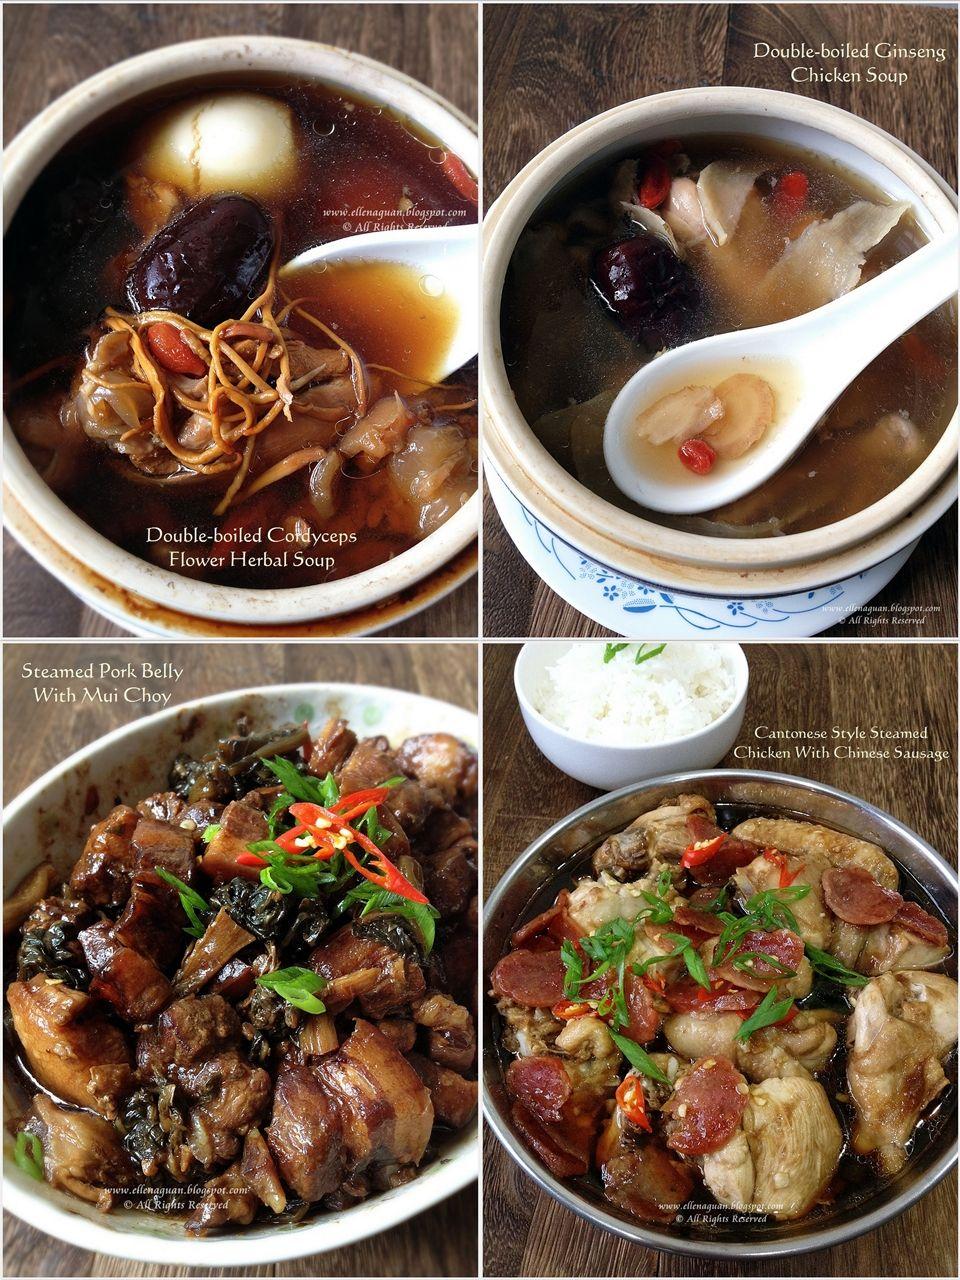 Cuisine paradise singapore food blog recipes reviews and cuisine paradise singapore food blog recipes reviews and travel 4 quick recipes forumfinder Choice Image